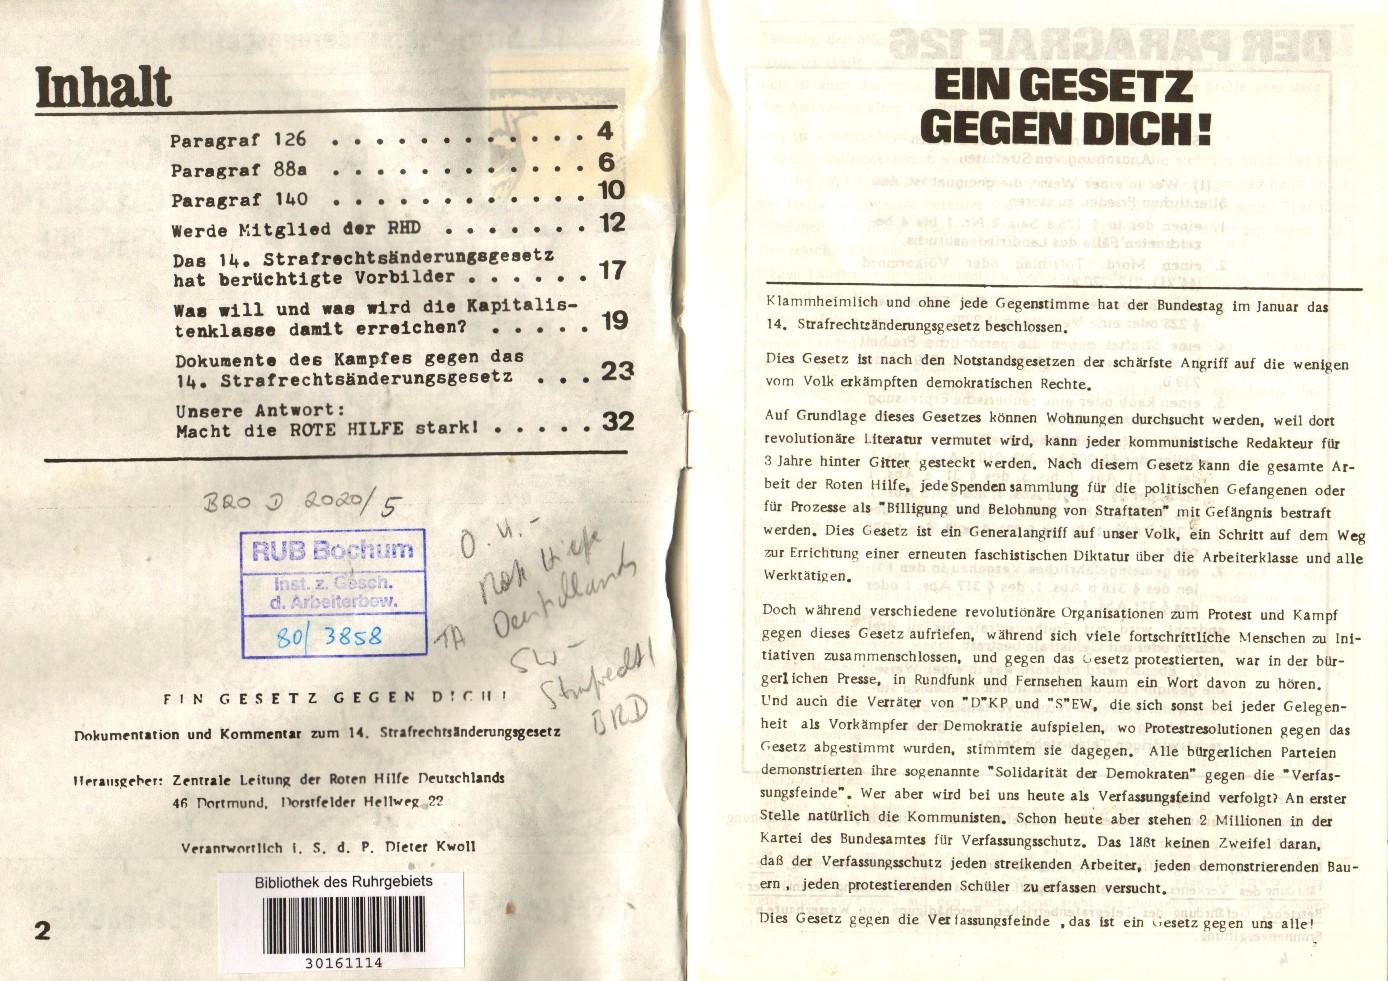 RHD_1976_Doku_Strafrechtsaenderungsgesetz_02